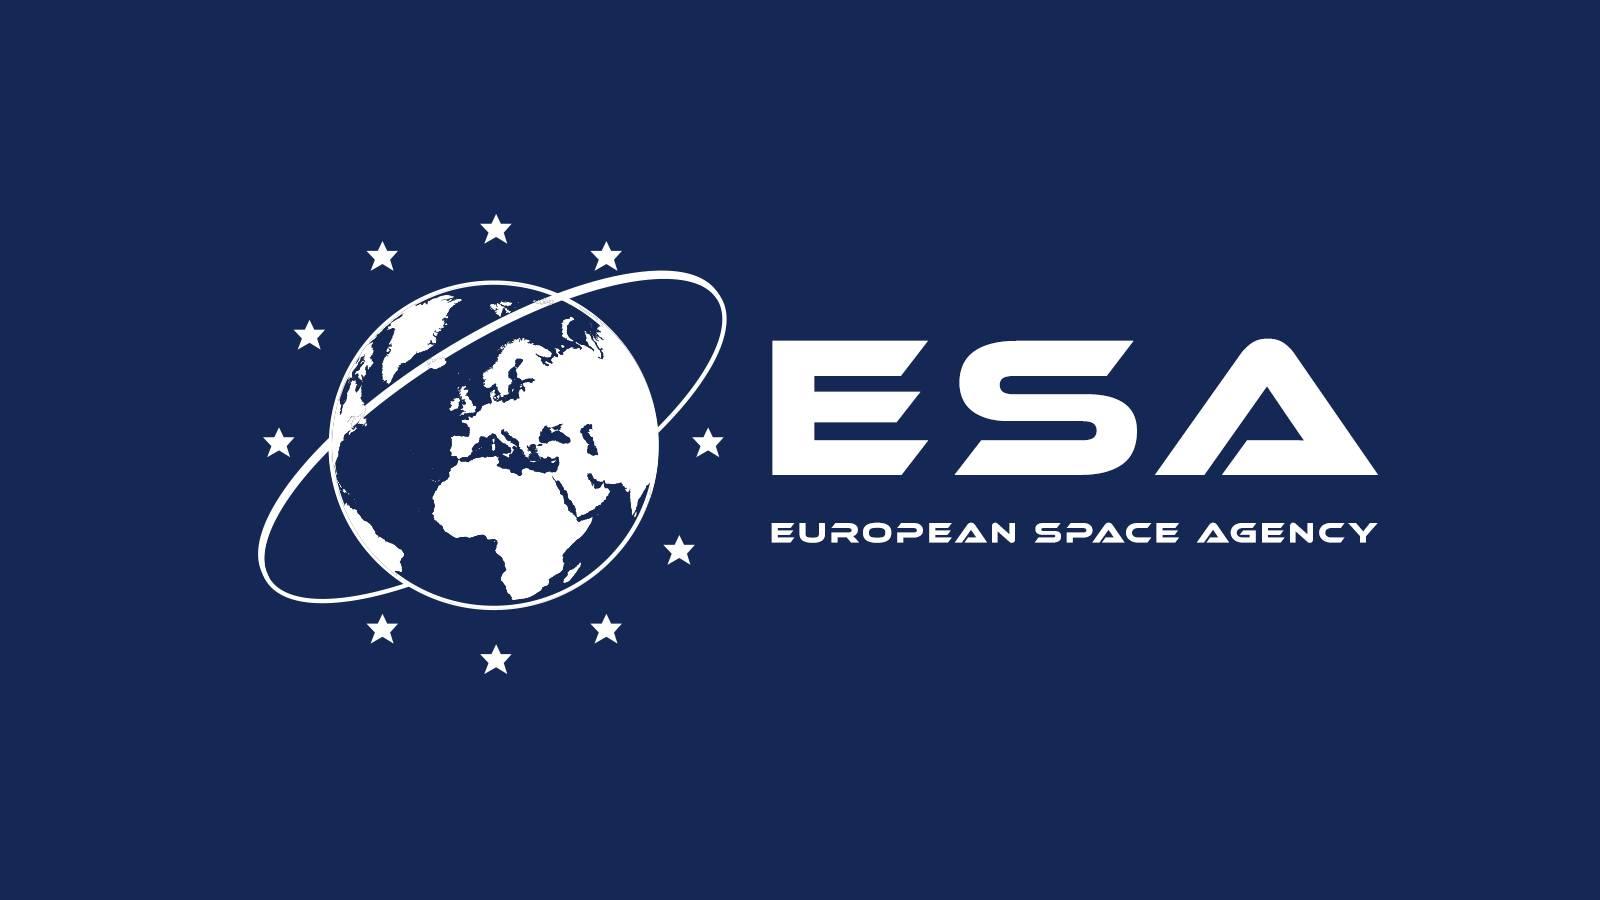 ESA Nave Spatiale Deriva Coronavirus